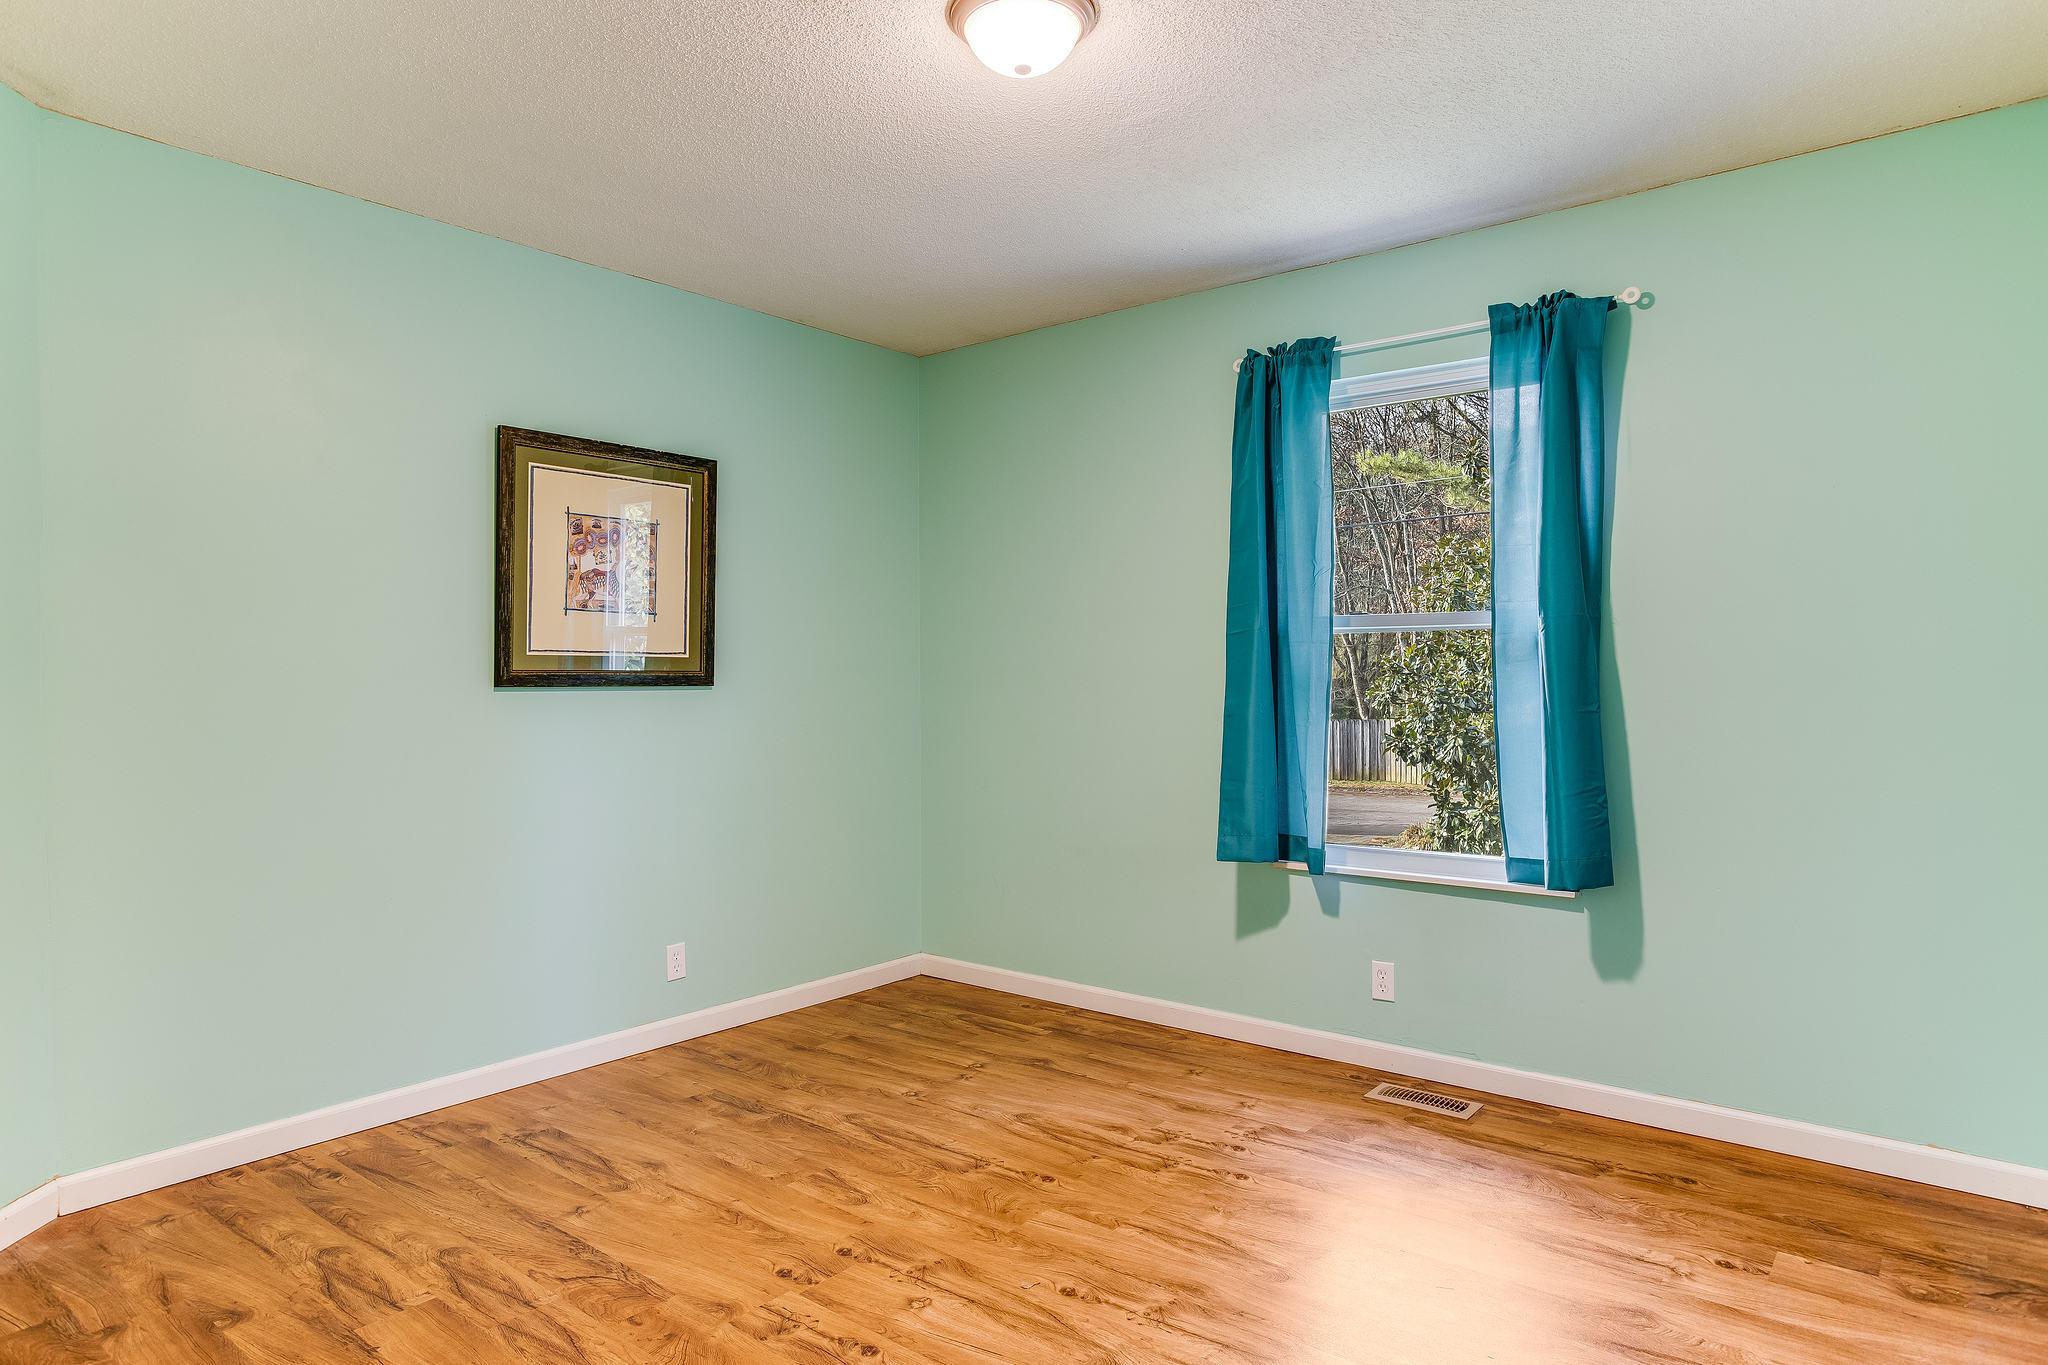 504 Bobolink Rd bedroom 3